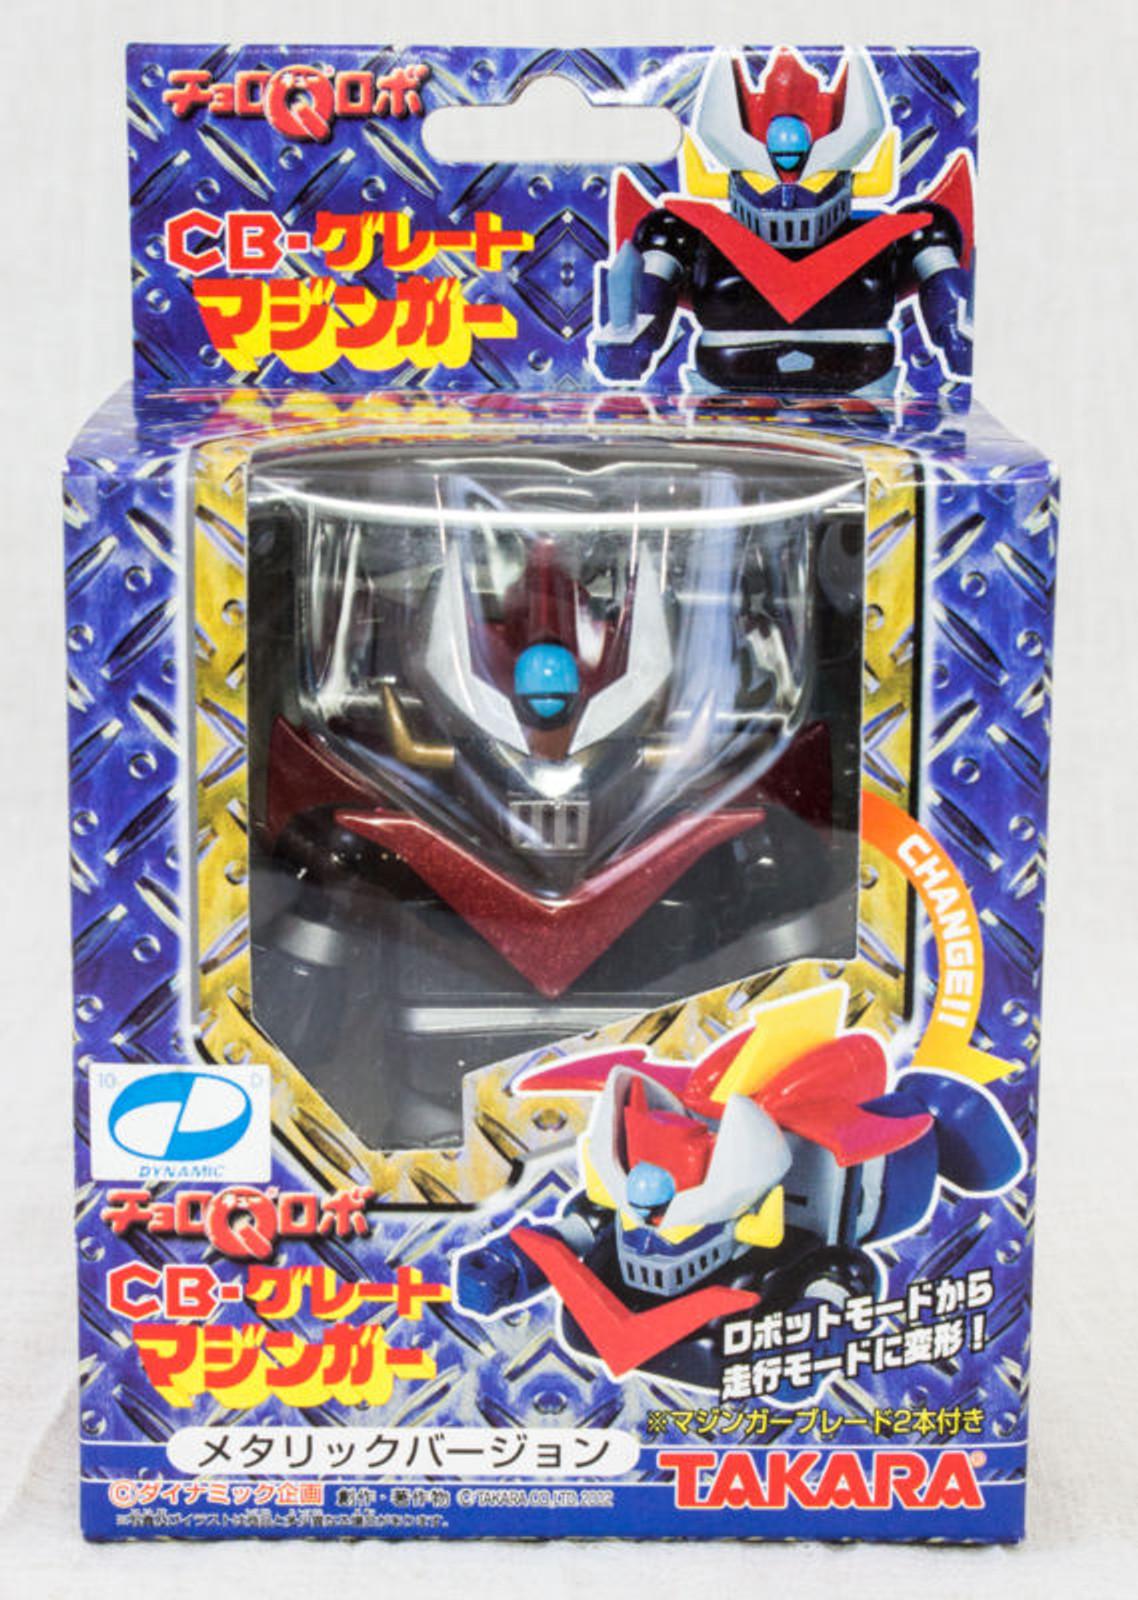 CB Great Mazinger Choro Q Robo Pull Back Car Figure Metallic Ver. TAKARA JAPAN